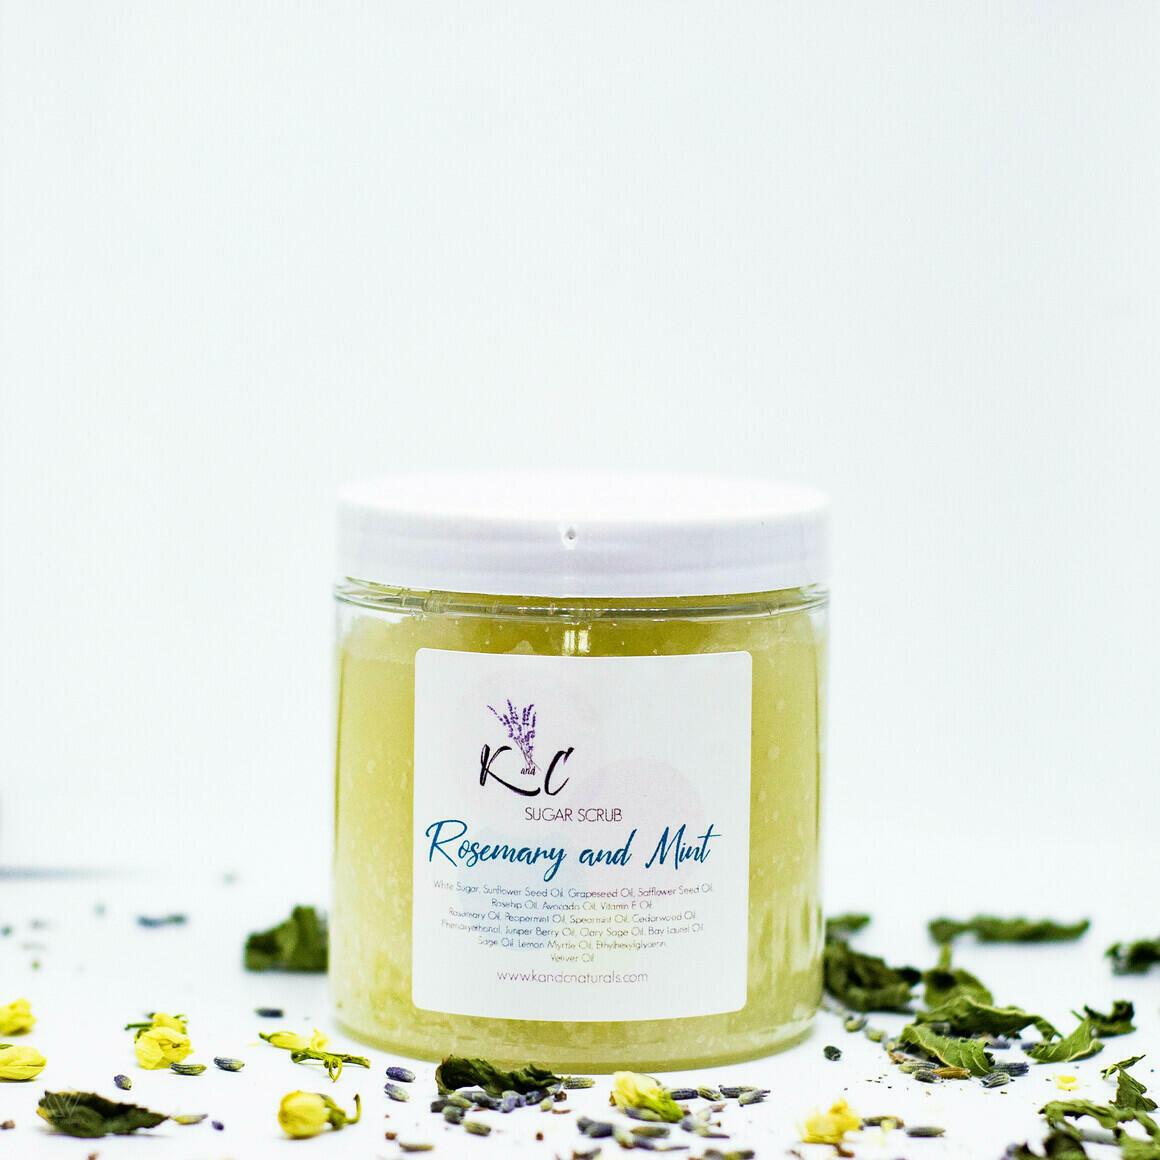 Rosemary & Mint Sugar Scrub | Trada Marketplace